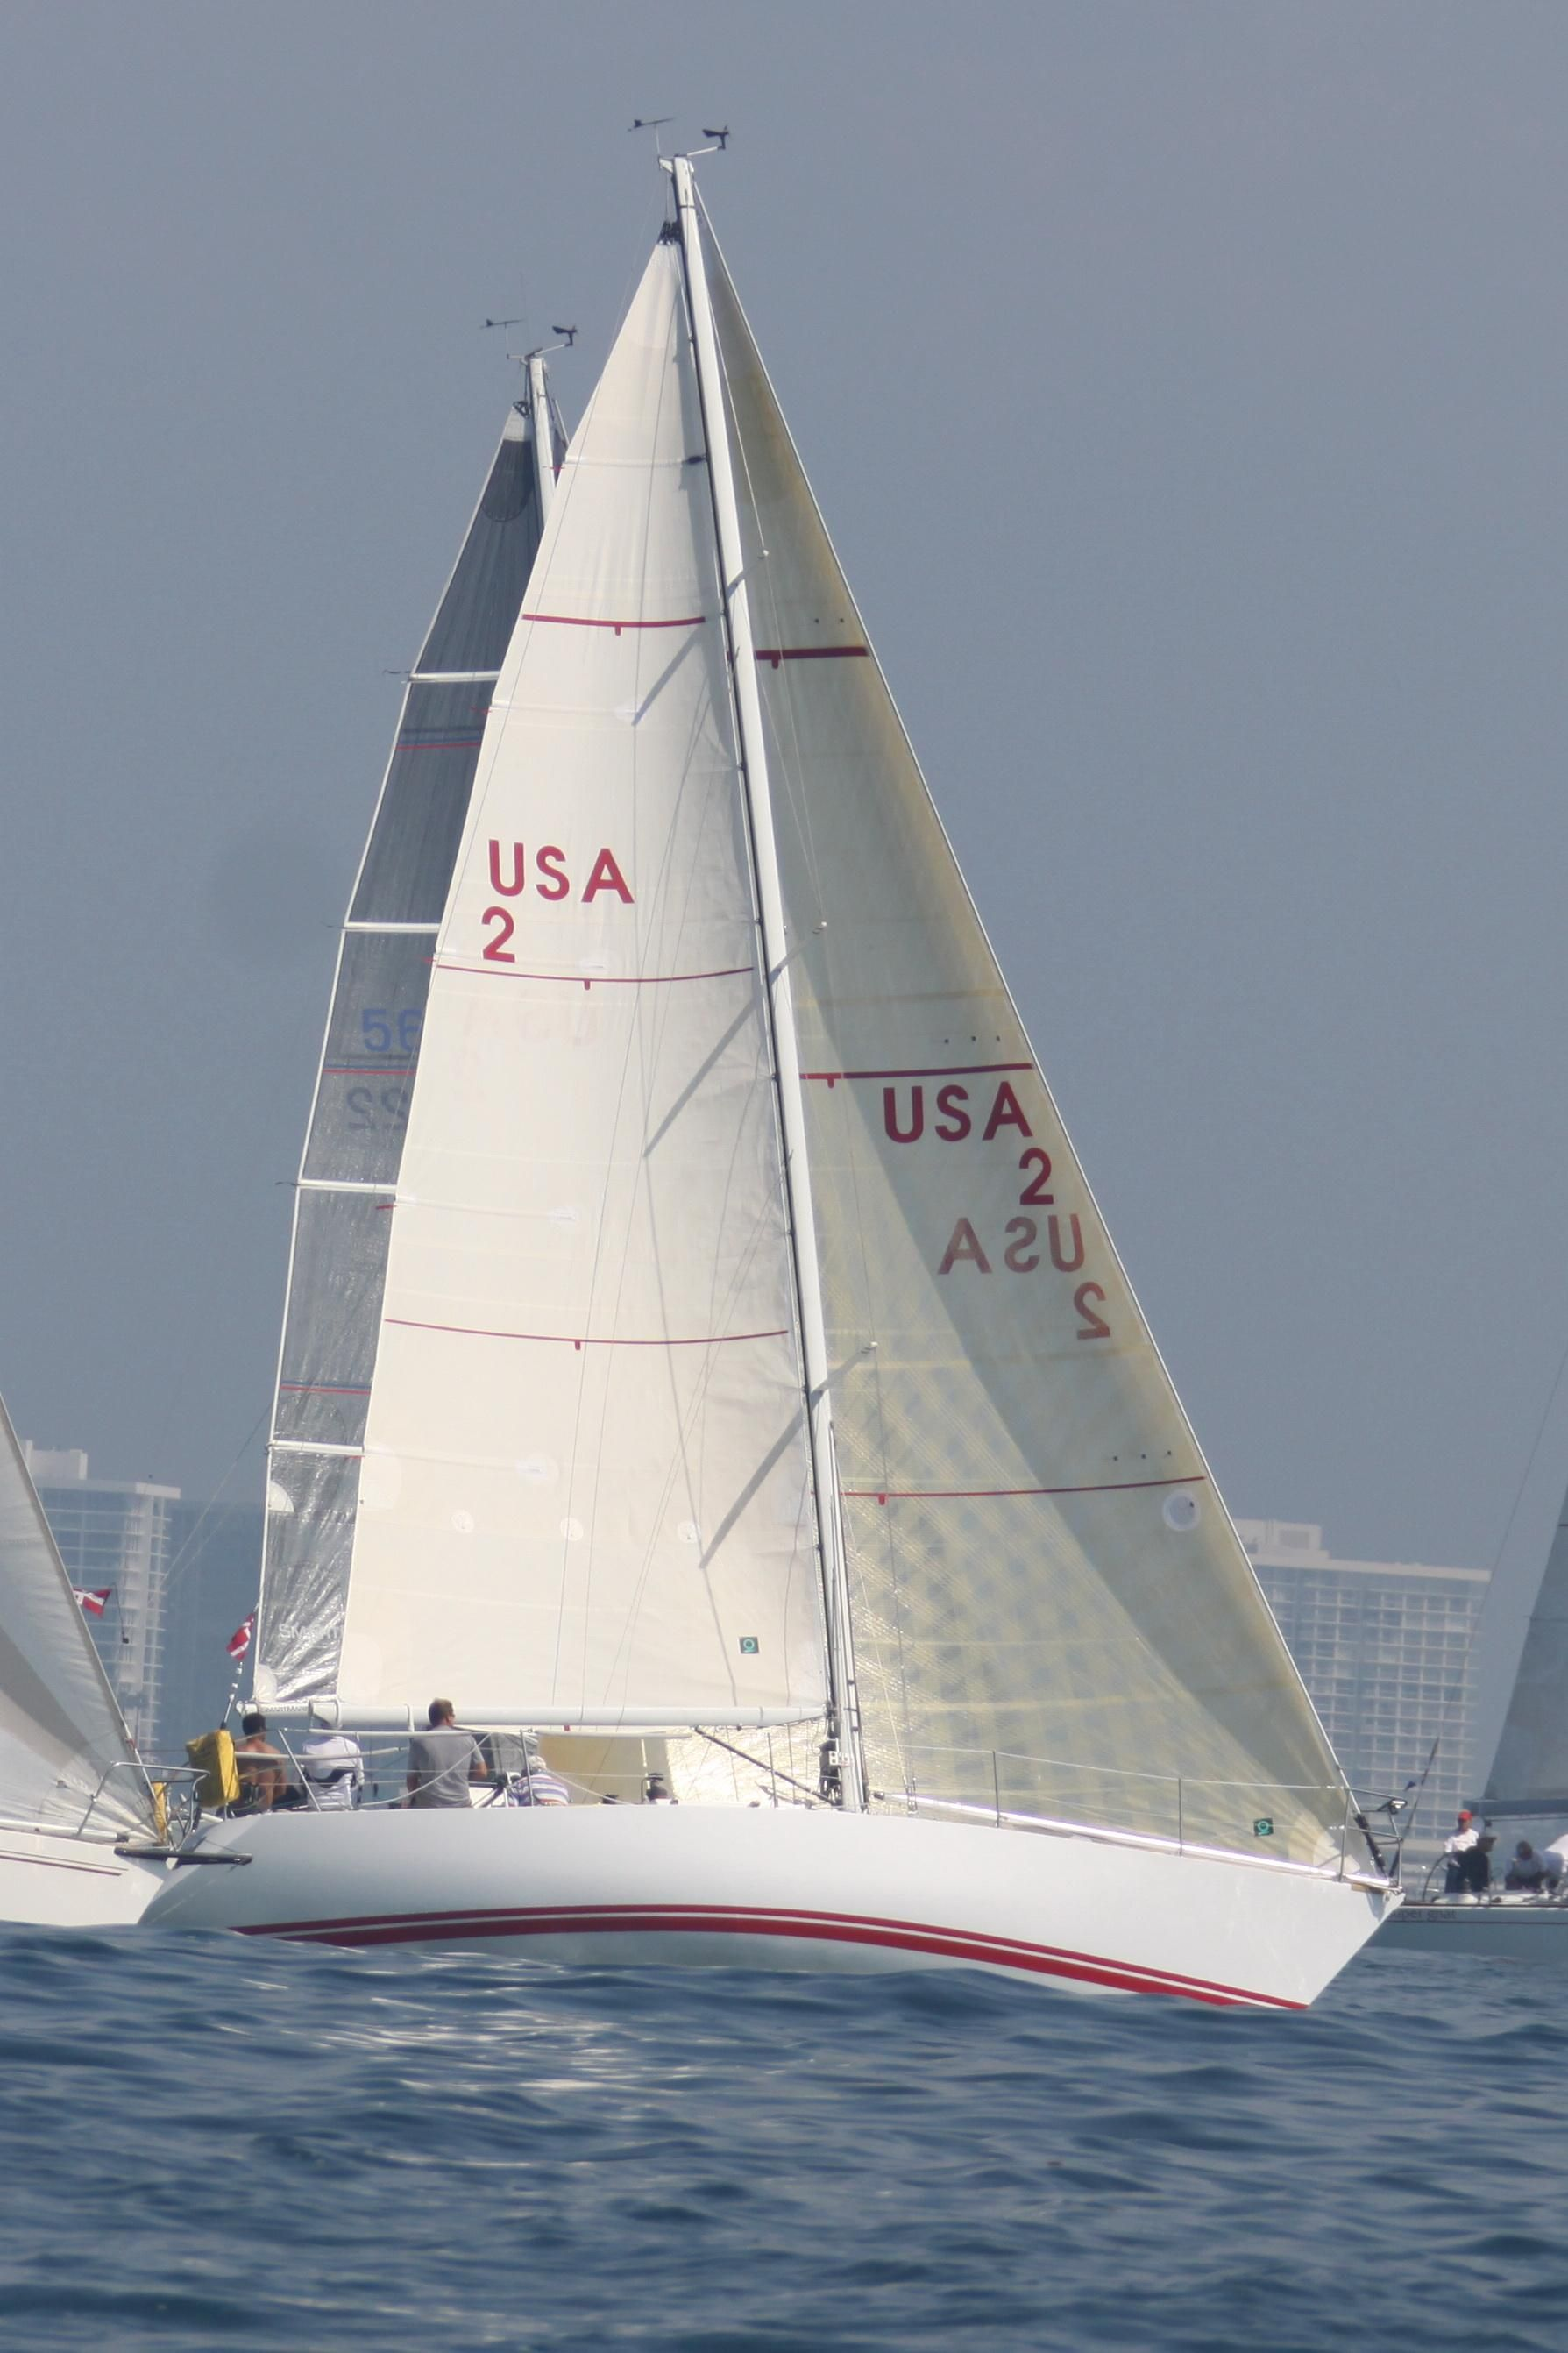 3 Year Loans >> 1979 Peterson Kiwi 37 Sail Boat For Sale - www.yachtworld.com